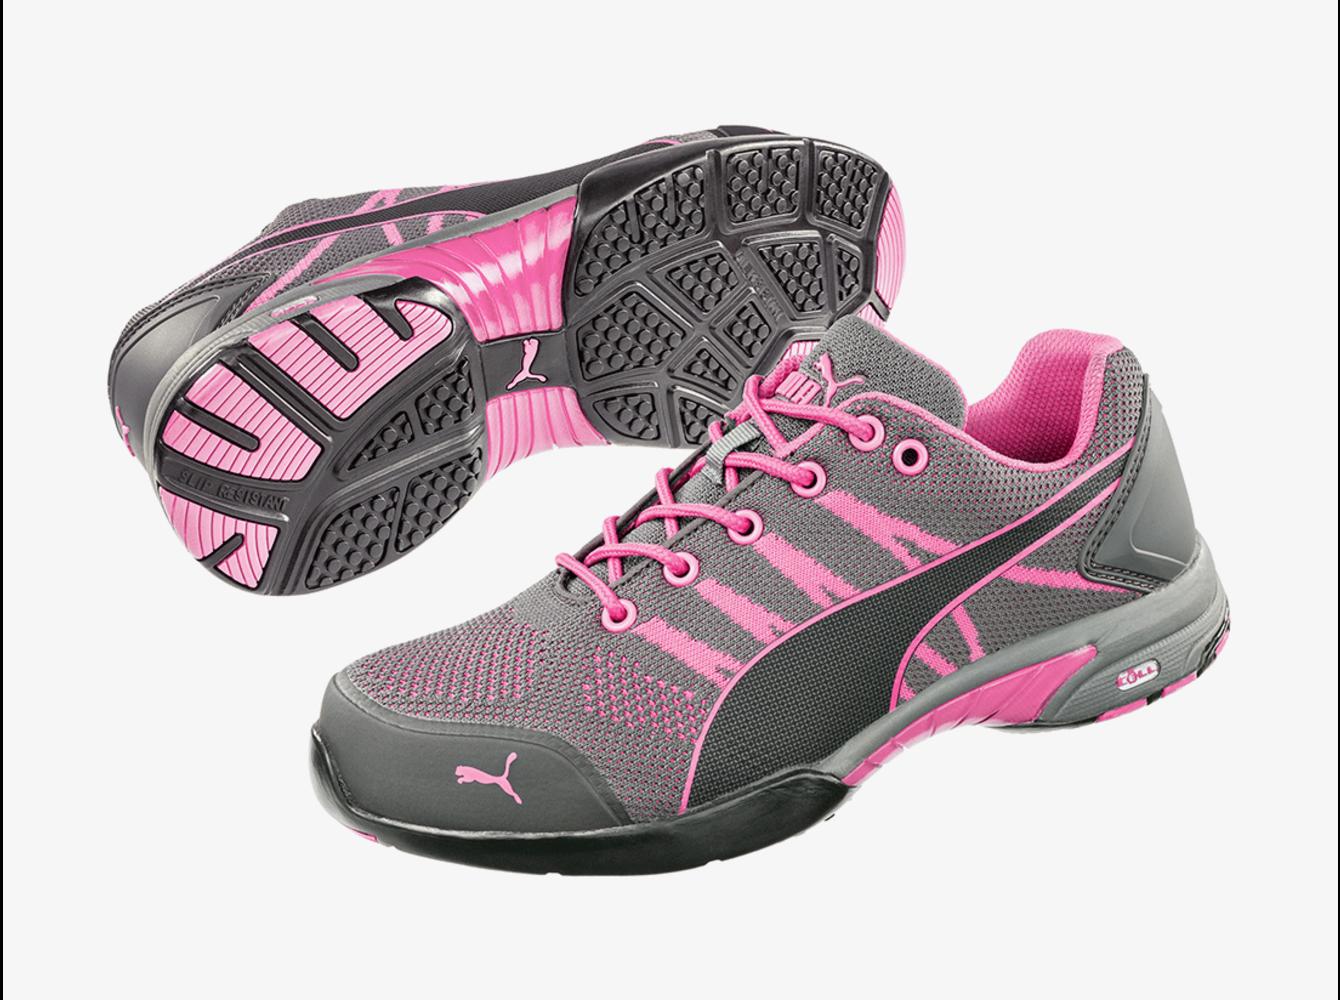 Puma 64.291.0 Celerity Knit Pink Wns Low S1